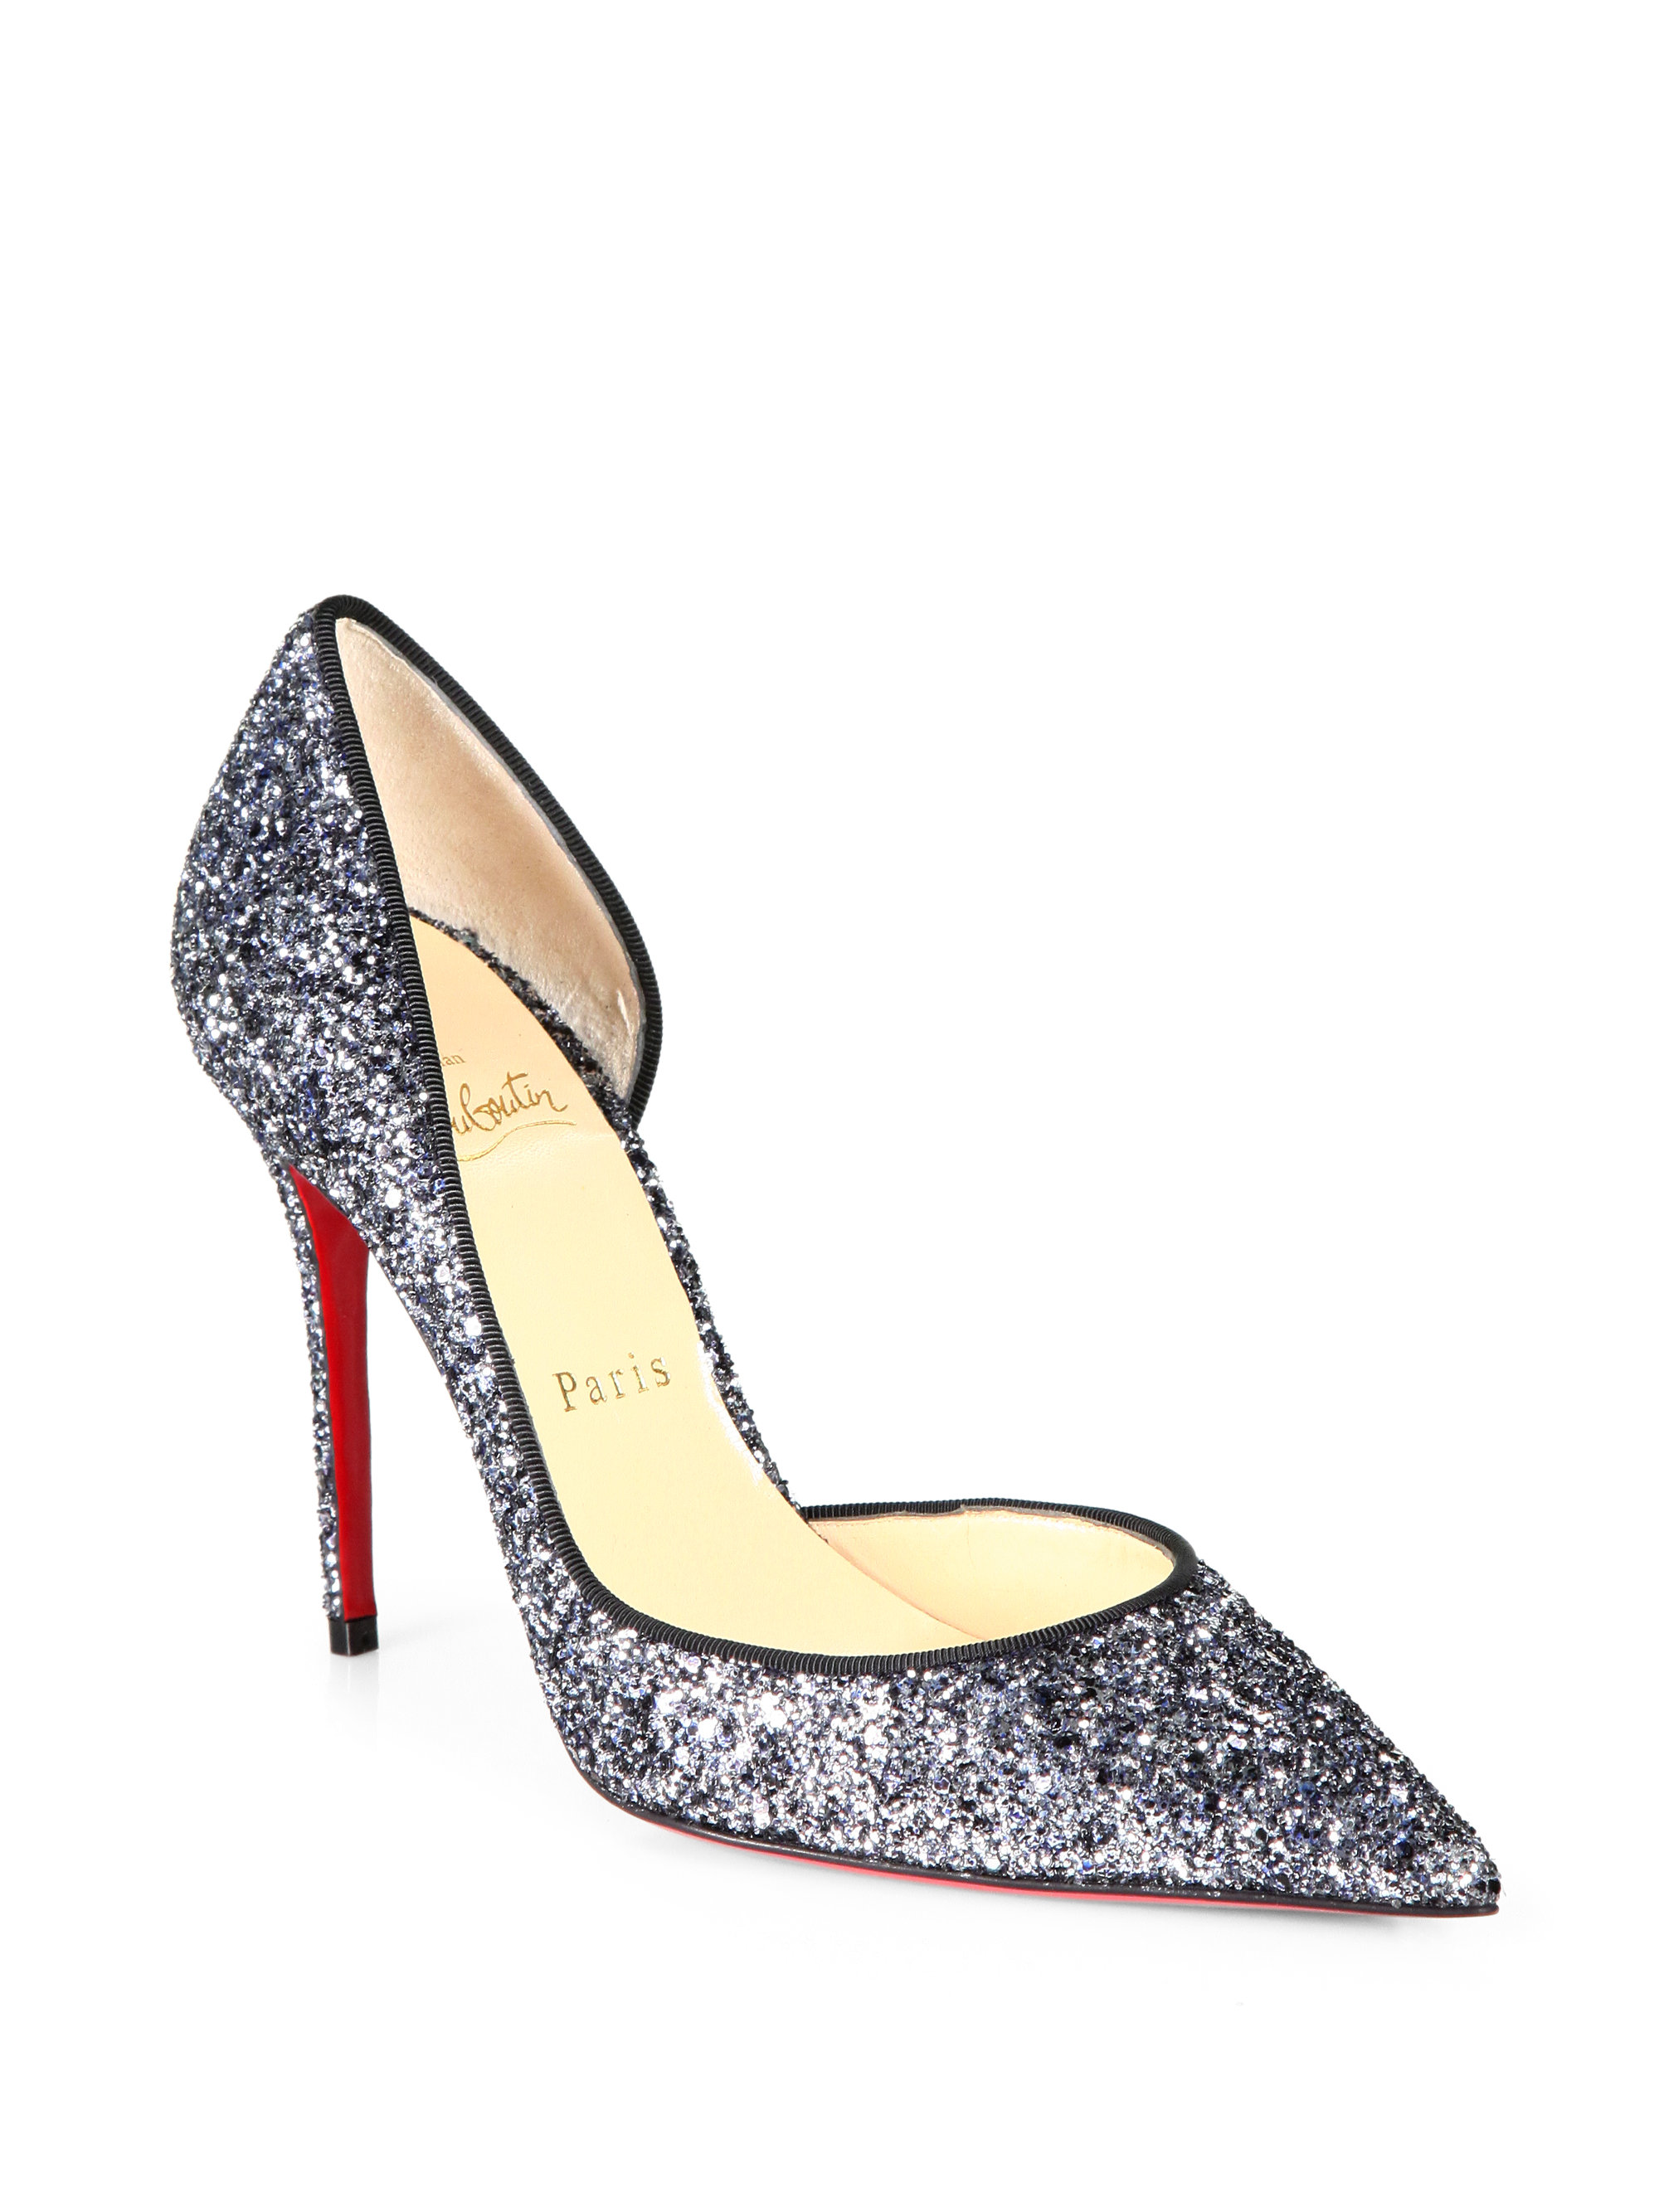 christian louboutin round-toe pumps Black glitter grosgrain trim ...